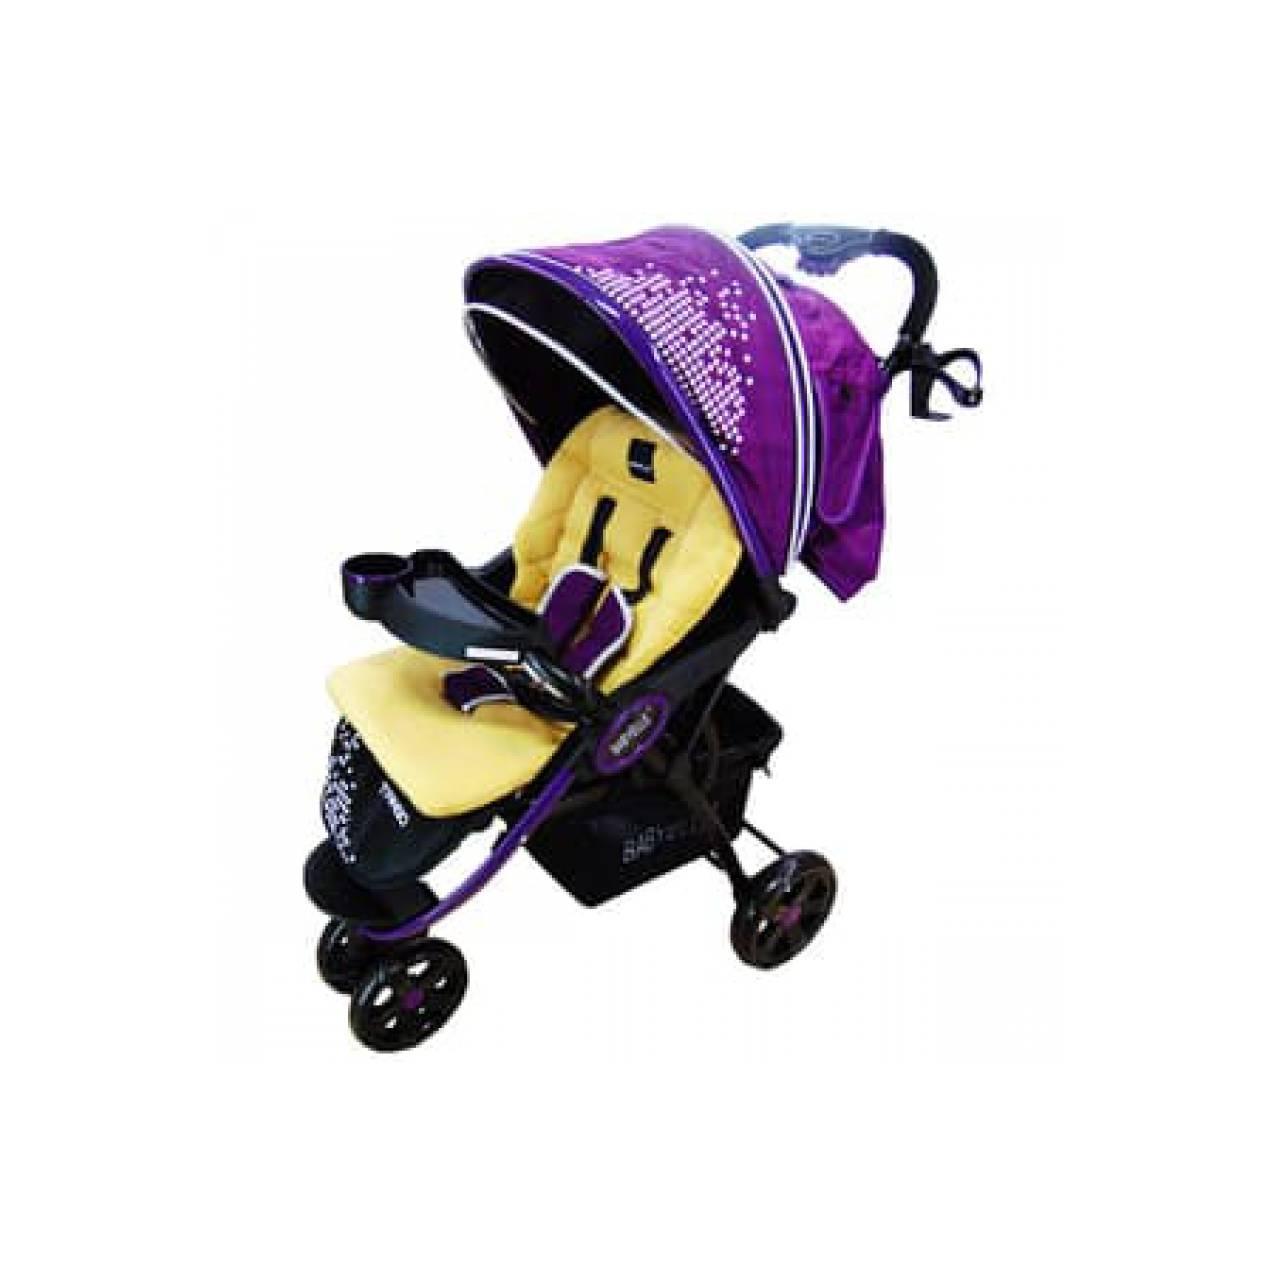 Babyelle Tango Stroller Single S 509 Baby Elle Gojek Chrisolins Chris Olins Vadso A817 Junior Labeille Kereta Dorong Bayi Like Pliko Coco Latte Creative S509 Murah